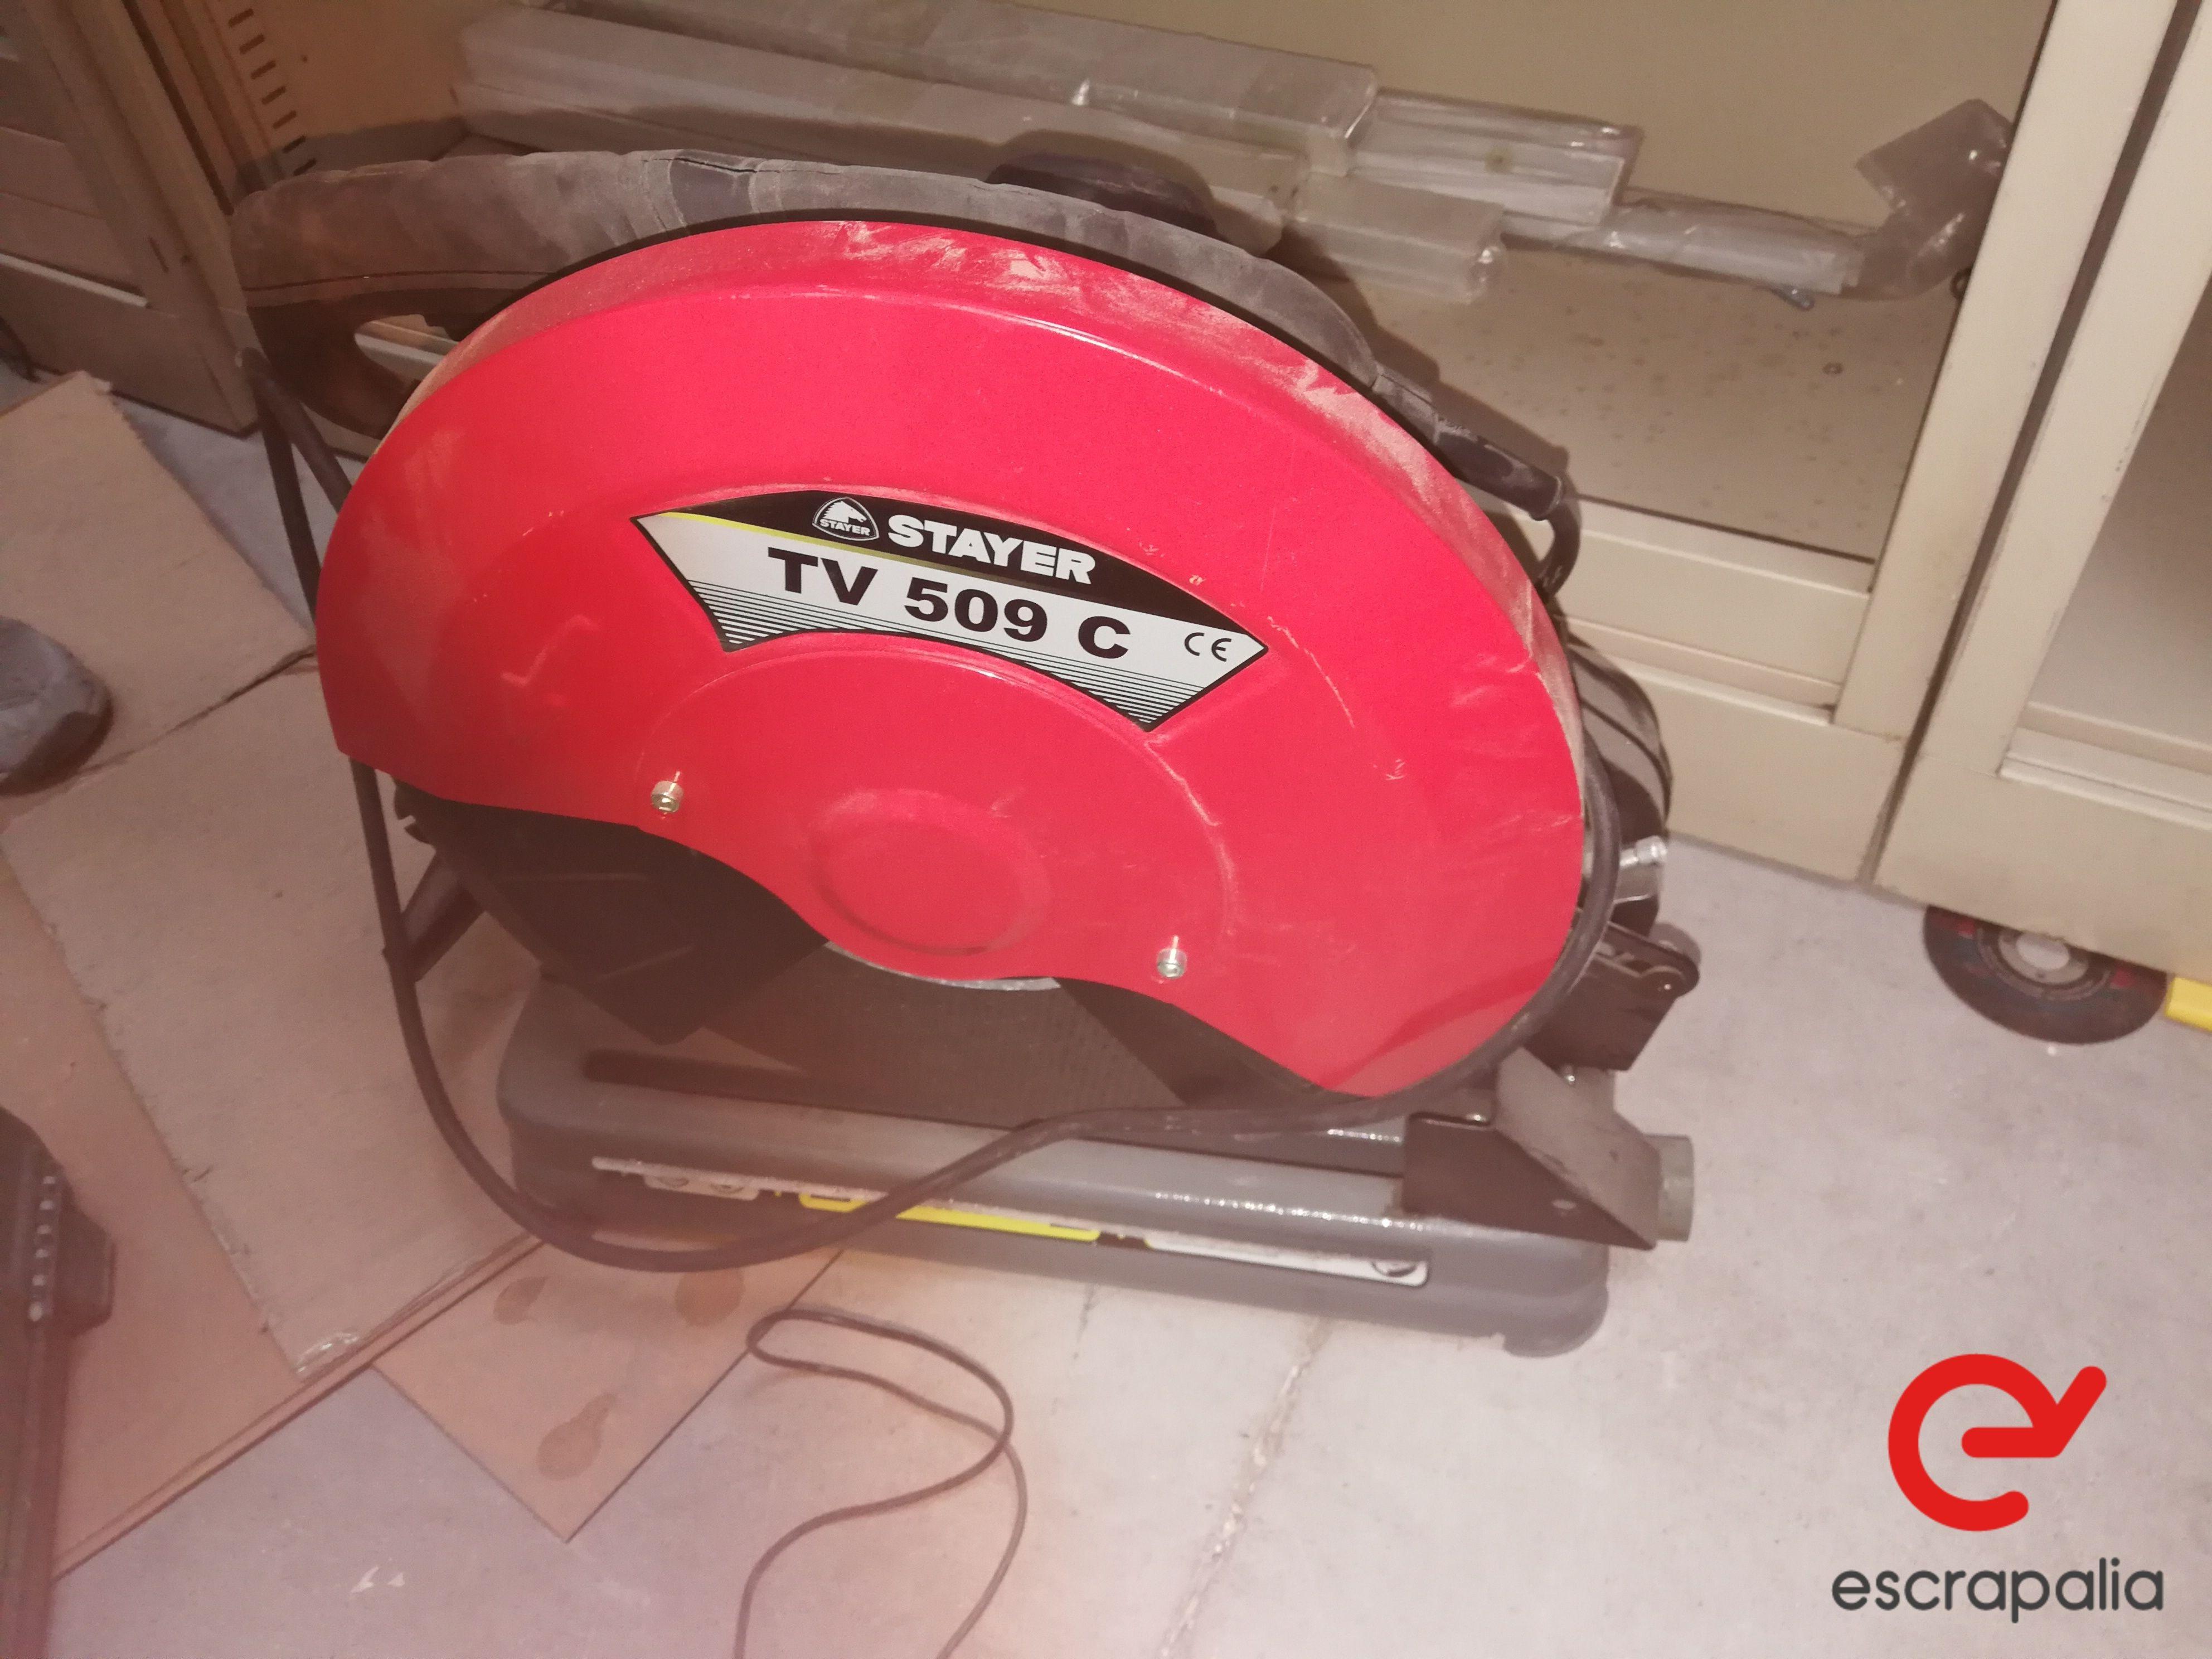 Zerspanungsmaschine Stayer TV 509 C. Lot 037